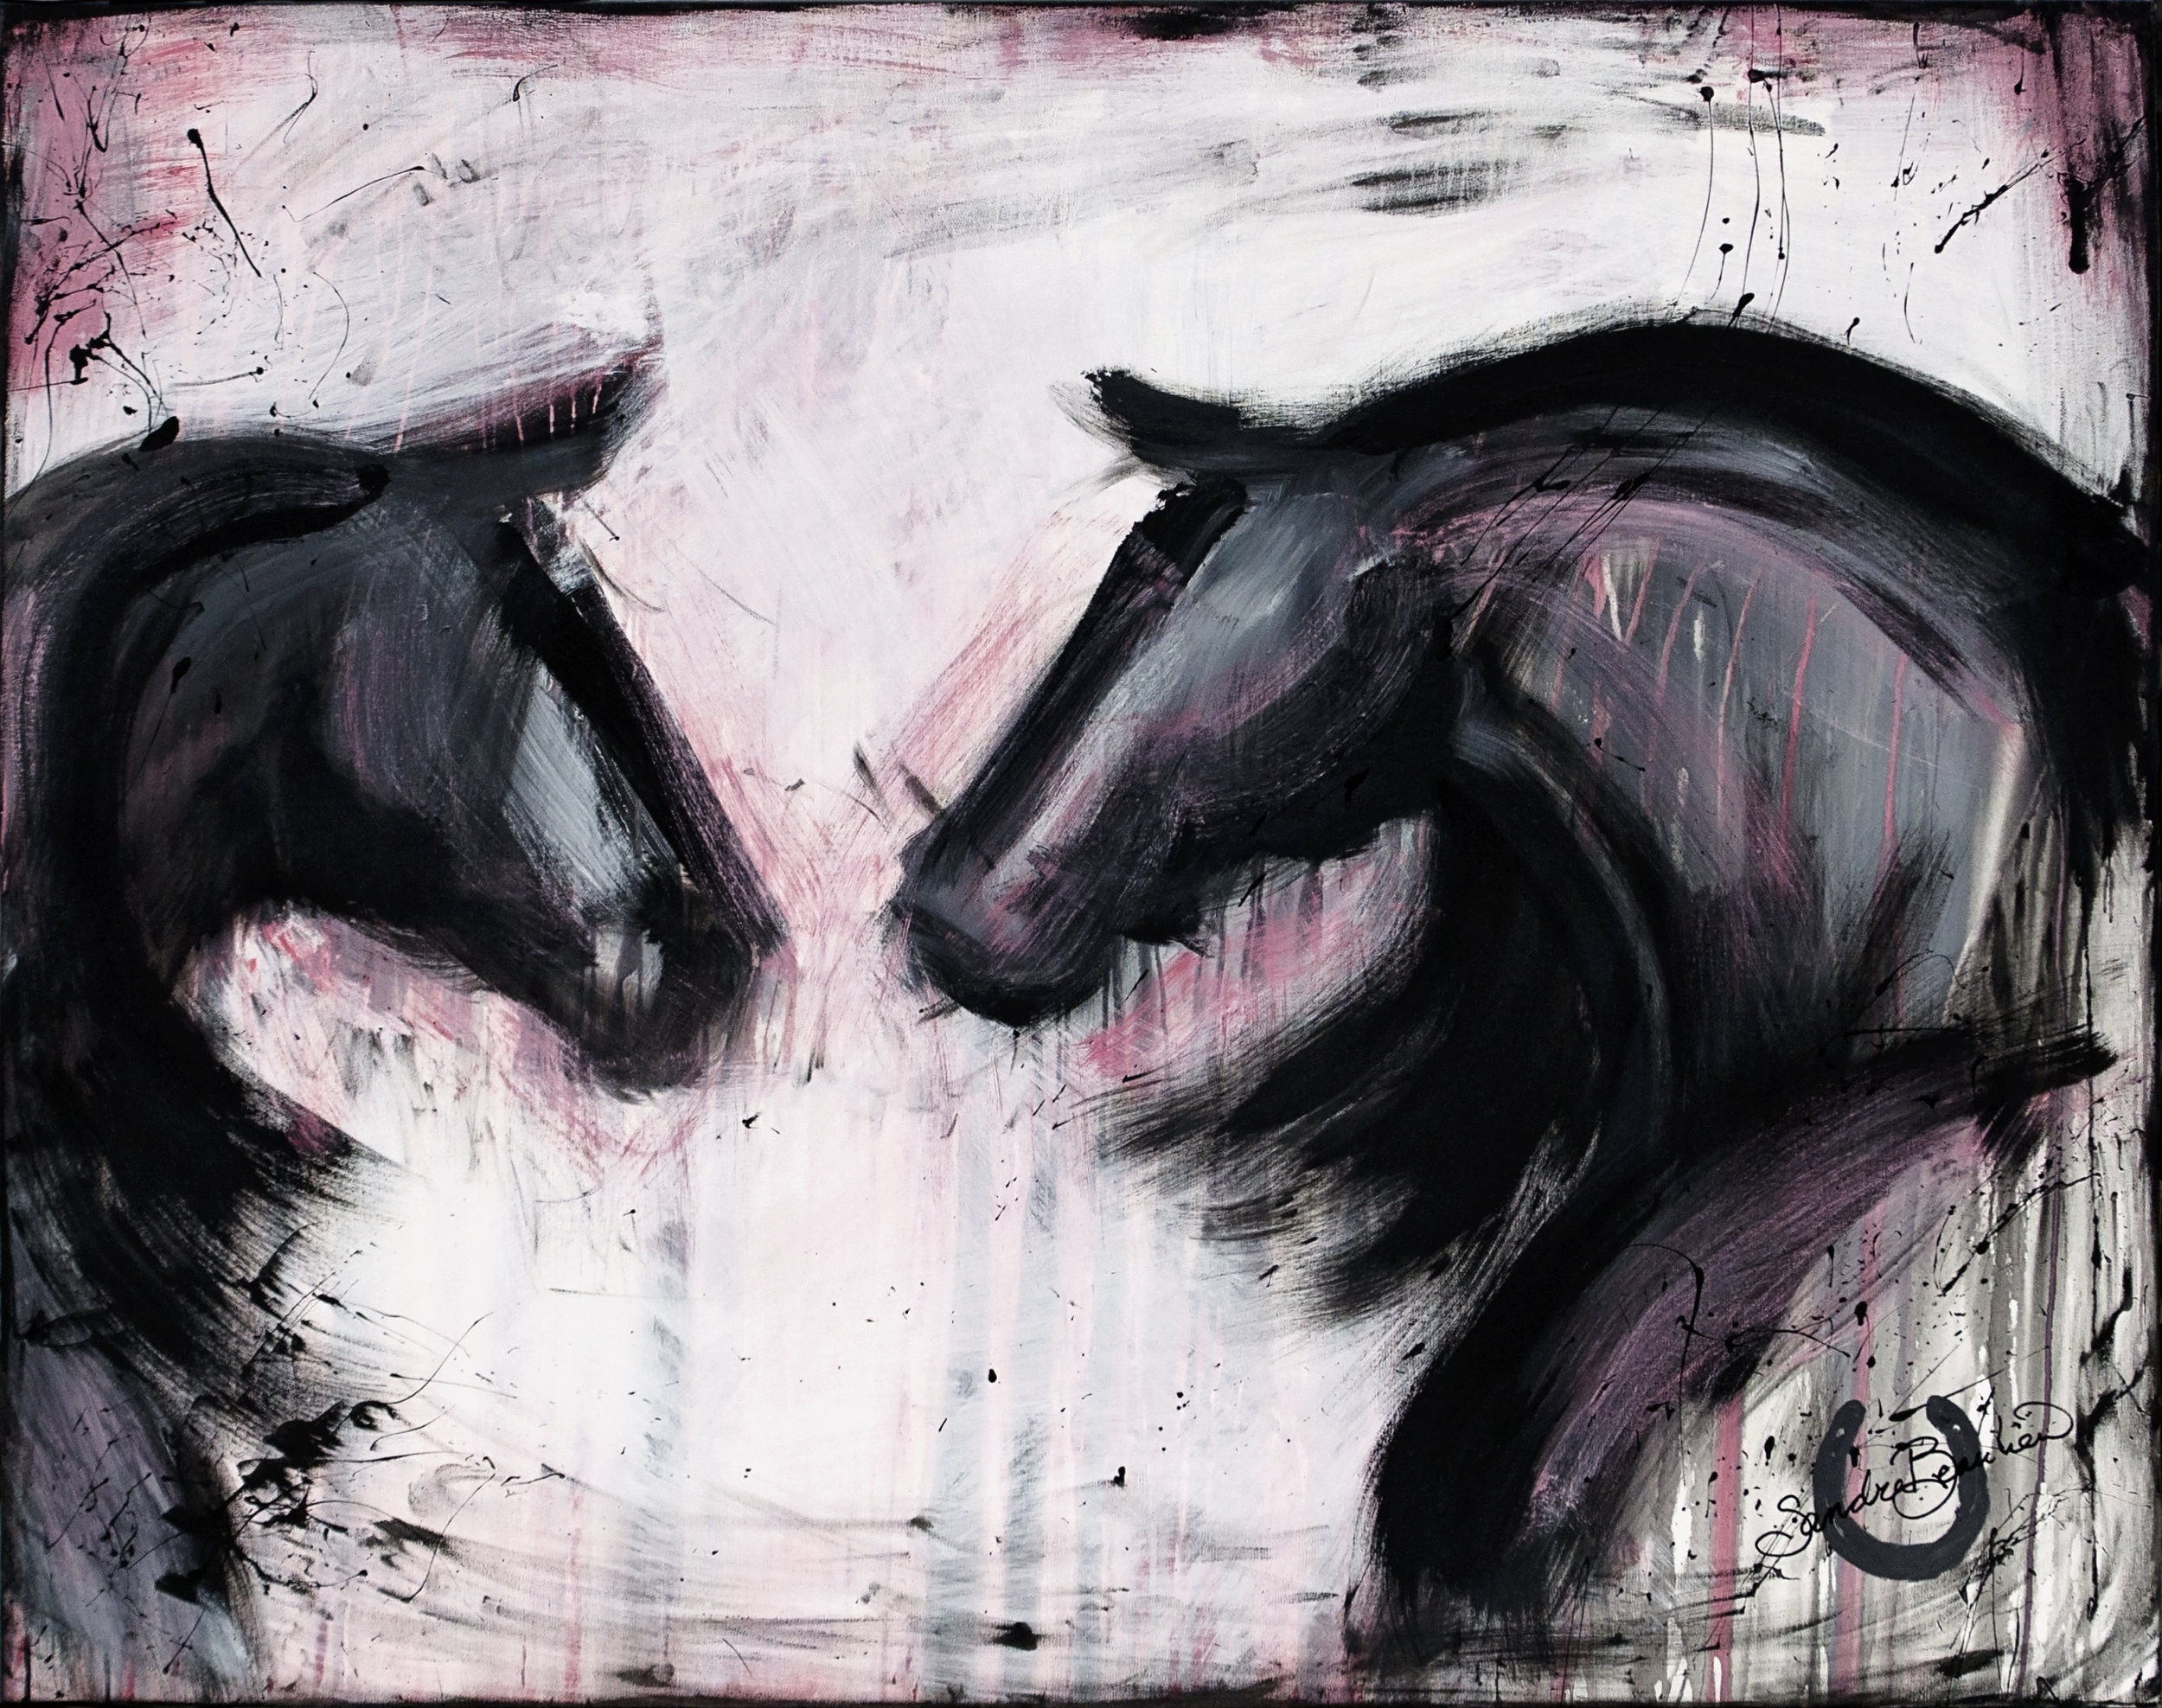 Equus Amore Chason Art on Horseback Abstract Canvas Painting Sandra Beaulieu.jpg